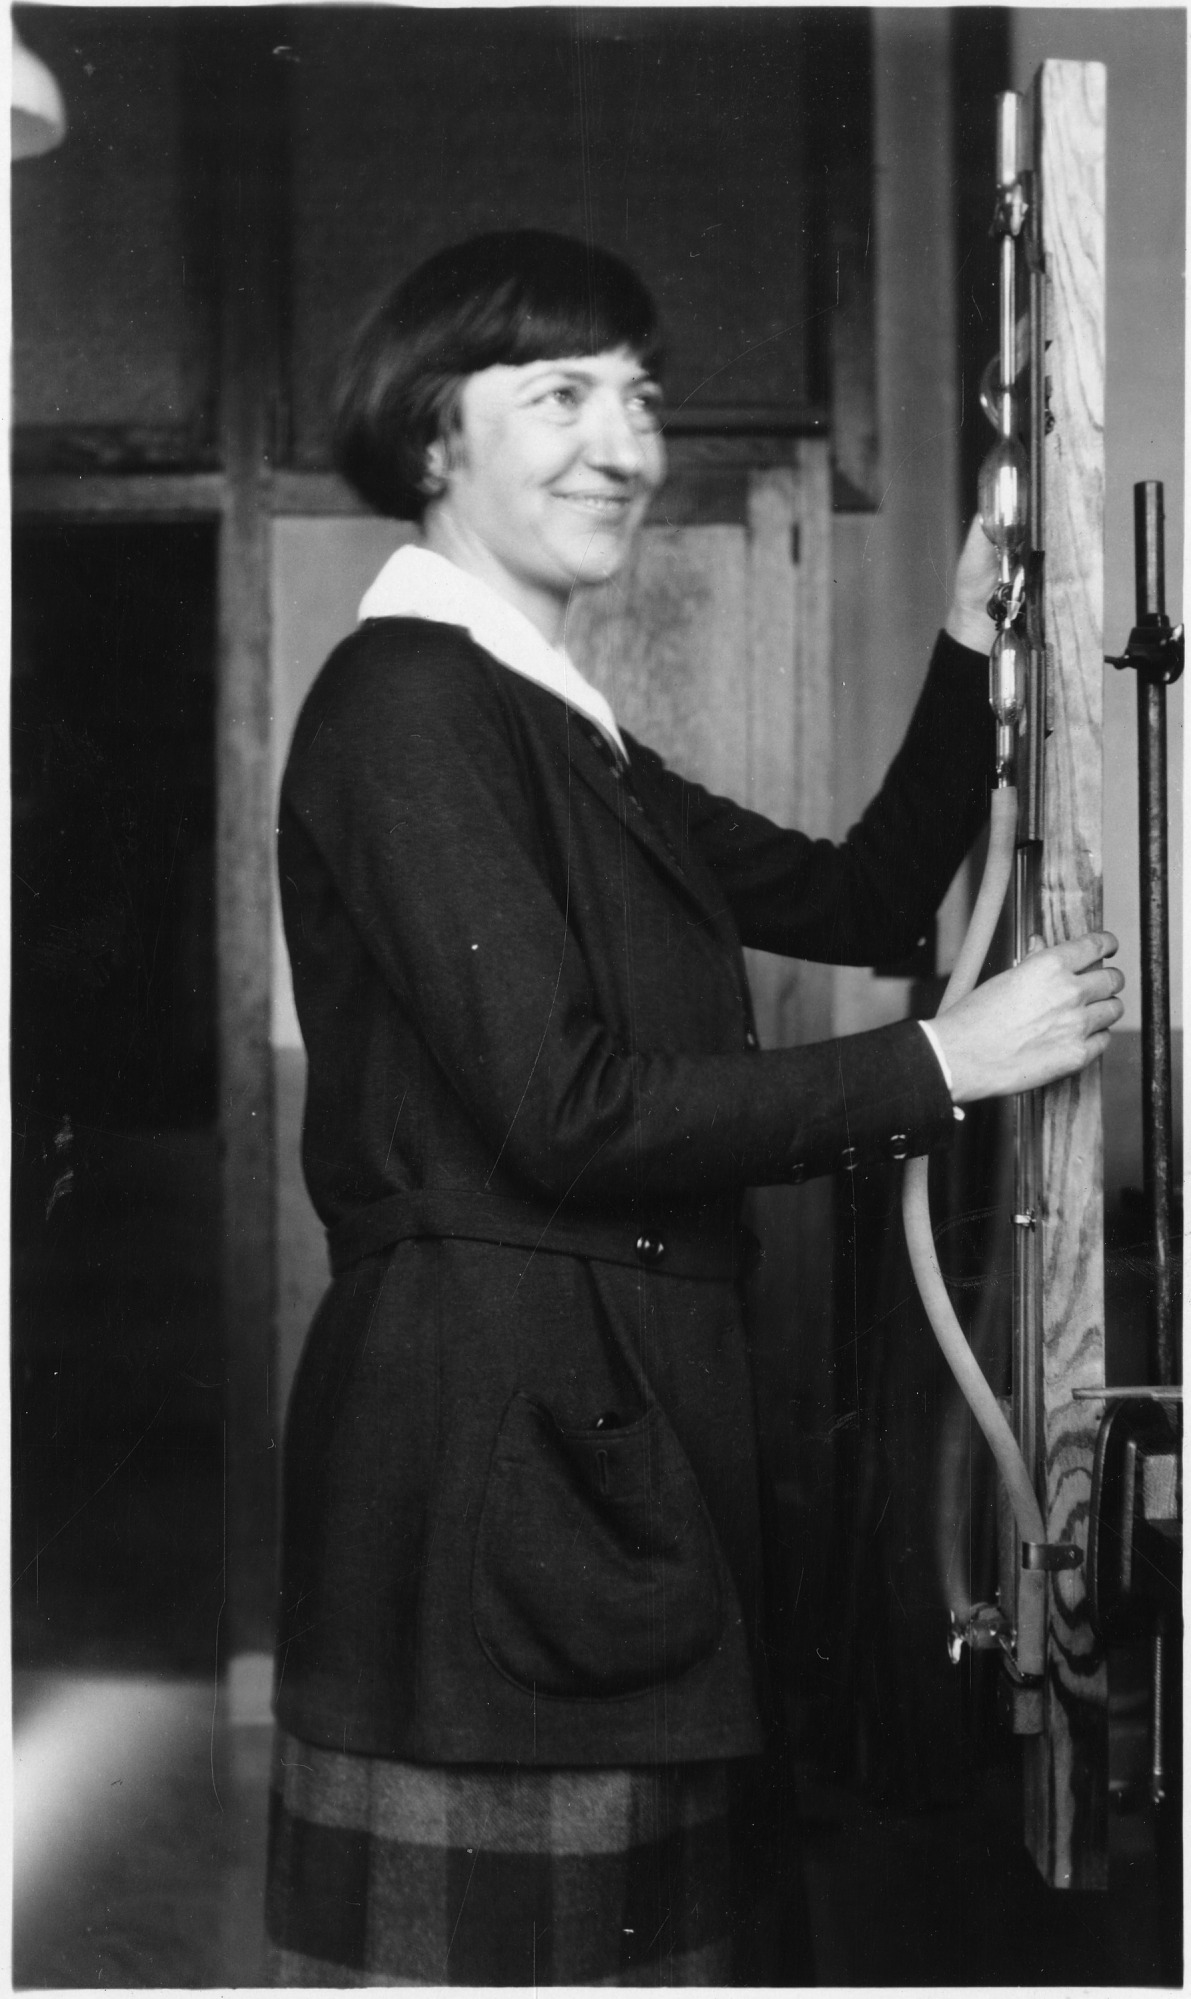 Ethel Ronzoni Bishop (1892-1975), Smithsonian Institution Archives, SIA Acc. 90-105 [SIA2009-2445].